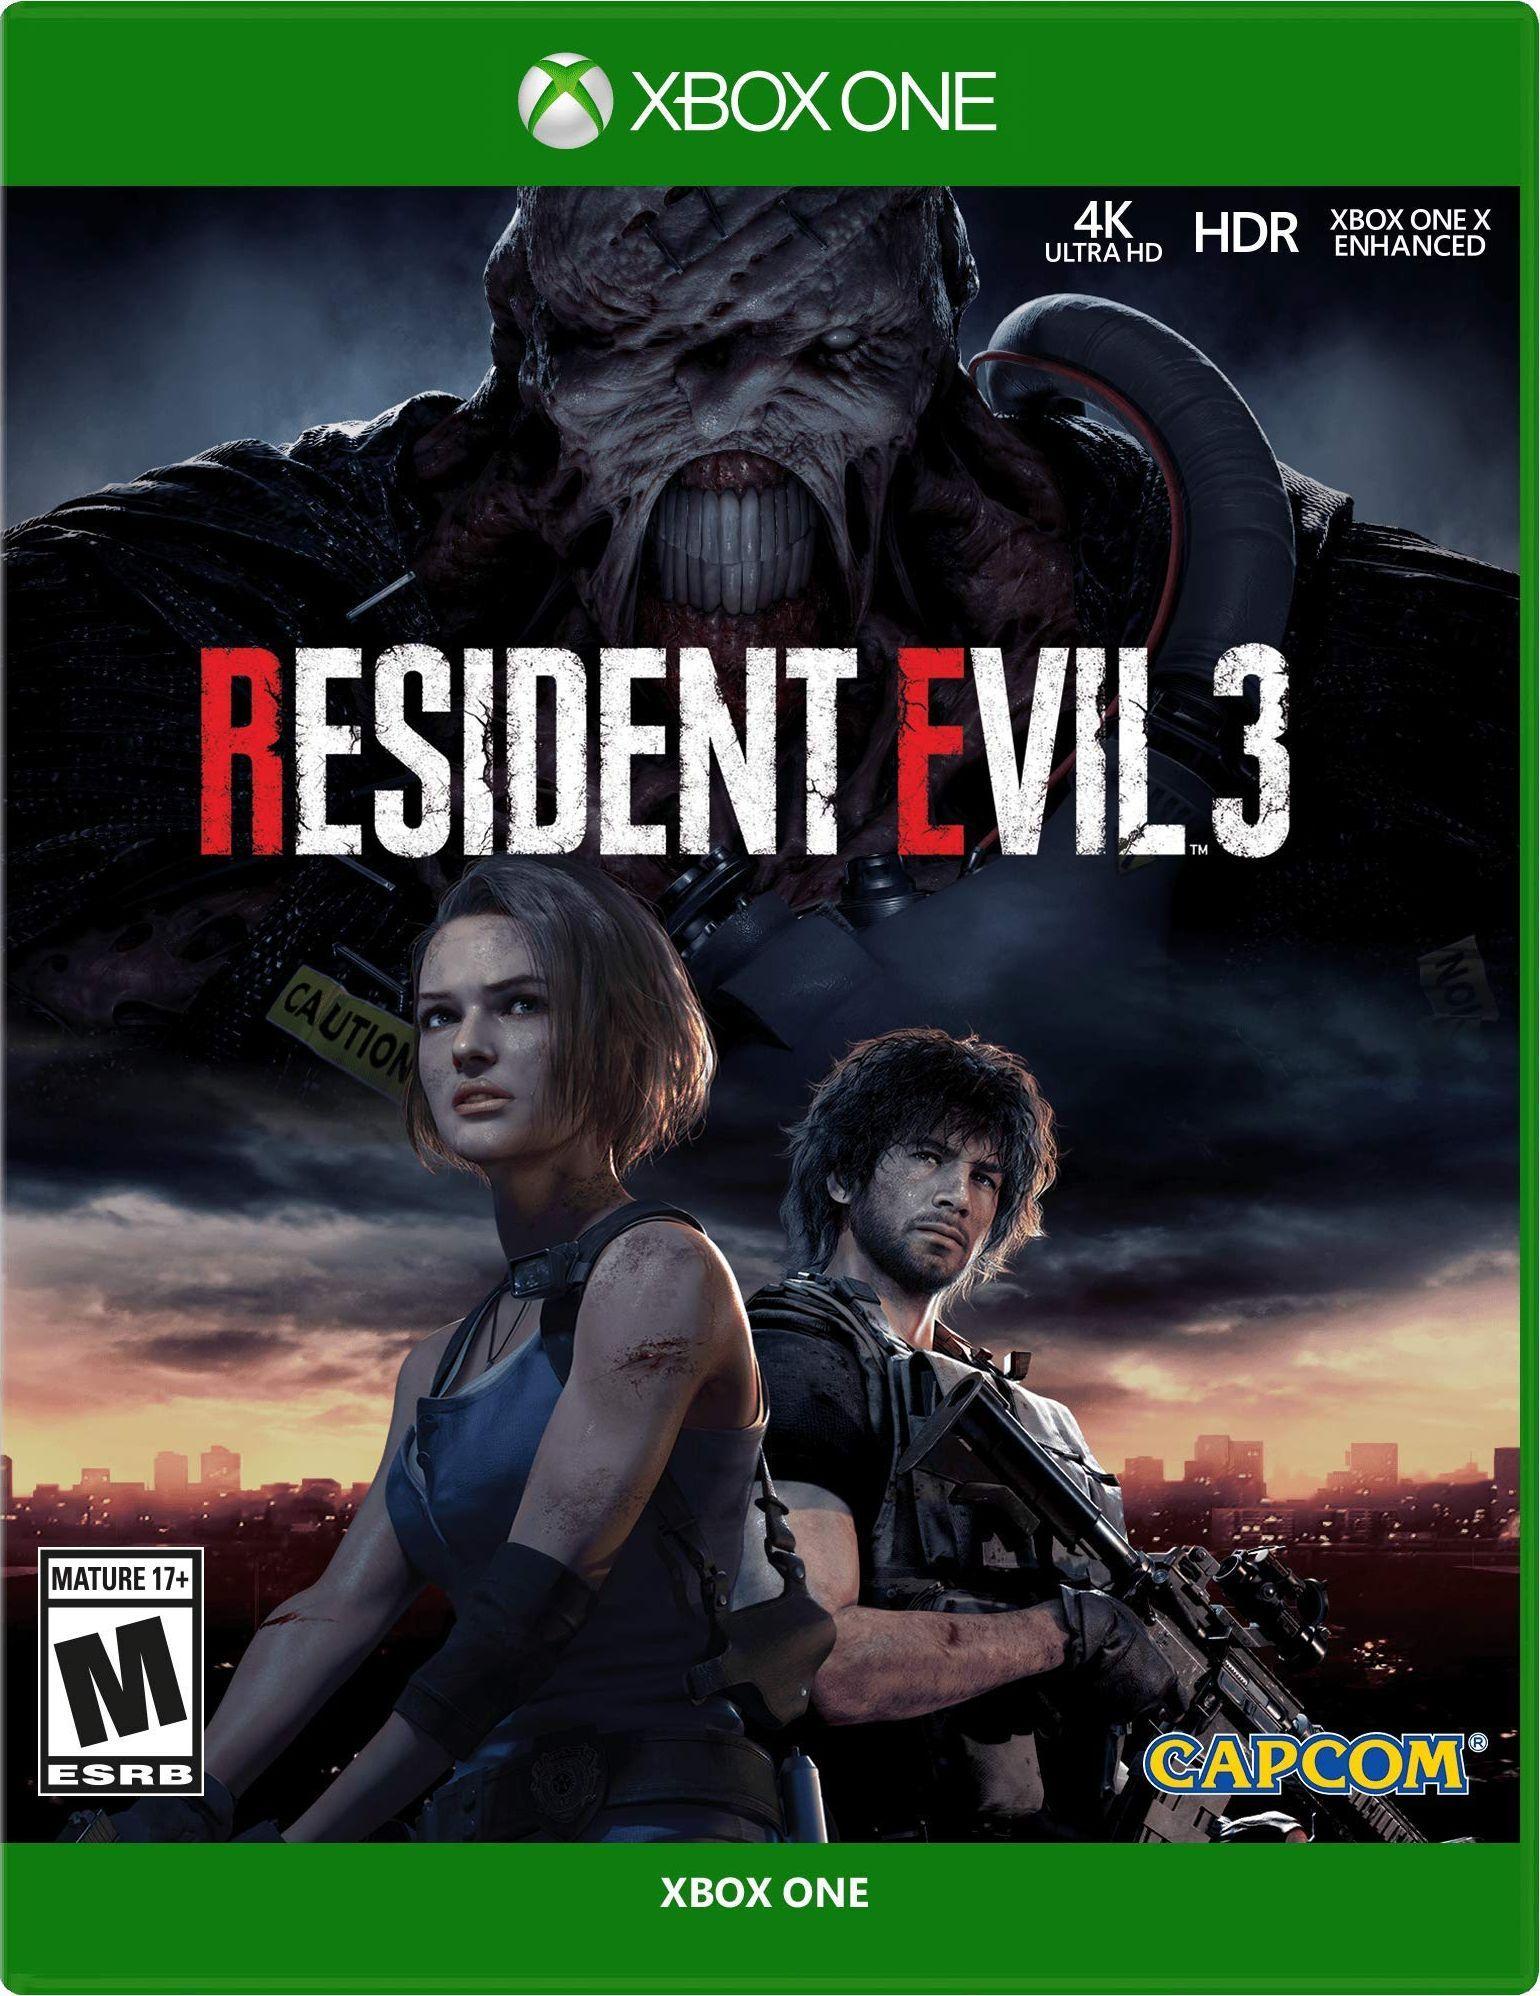 Resident Evil 3 In 2020 With Images Resident Evil Resident